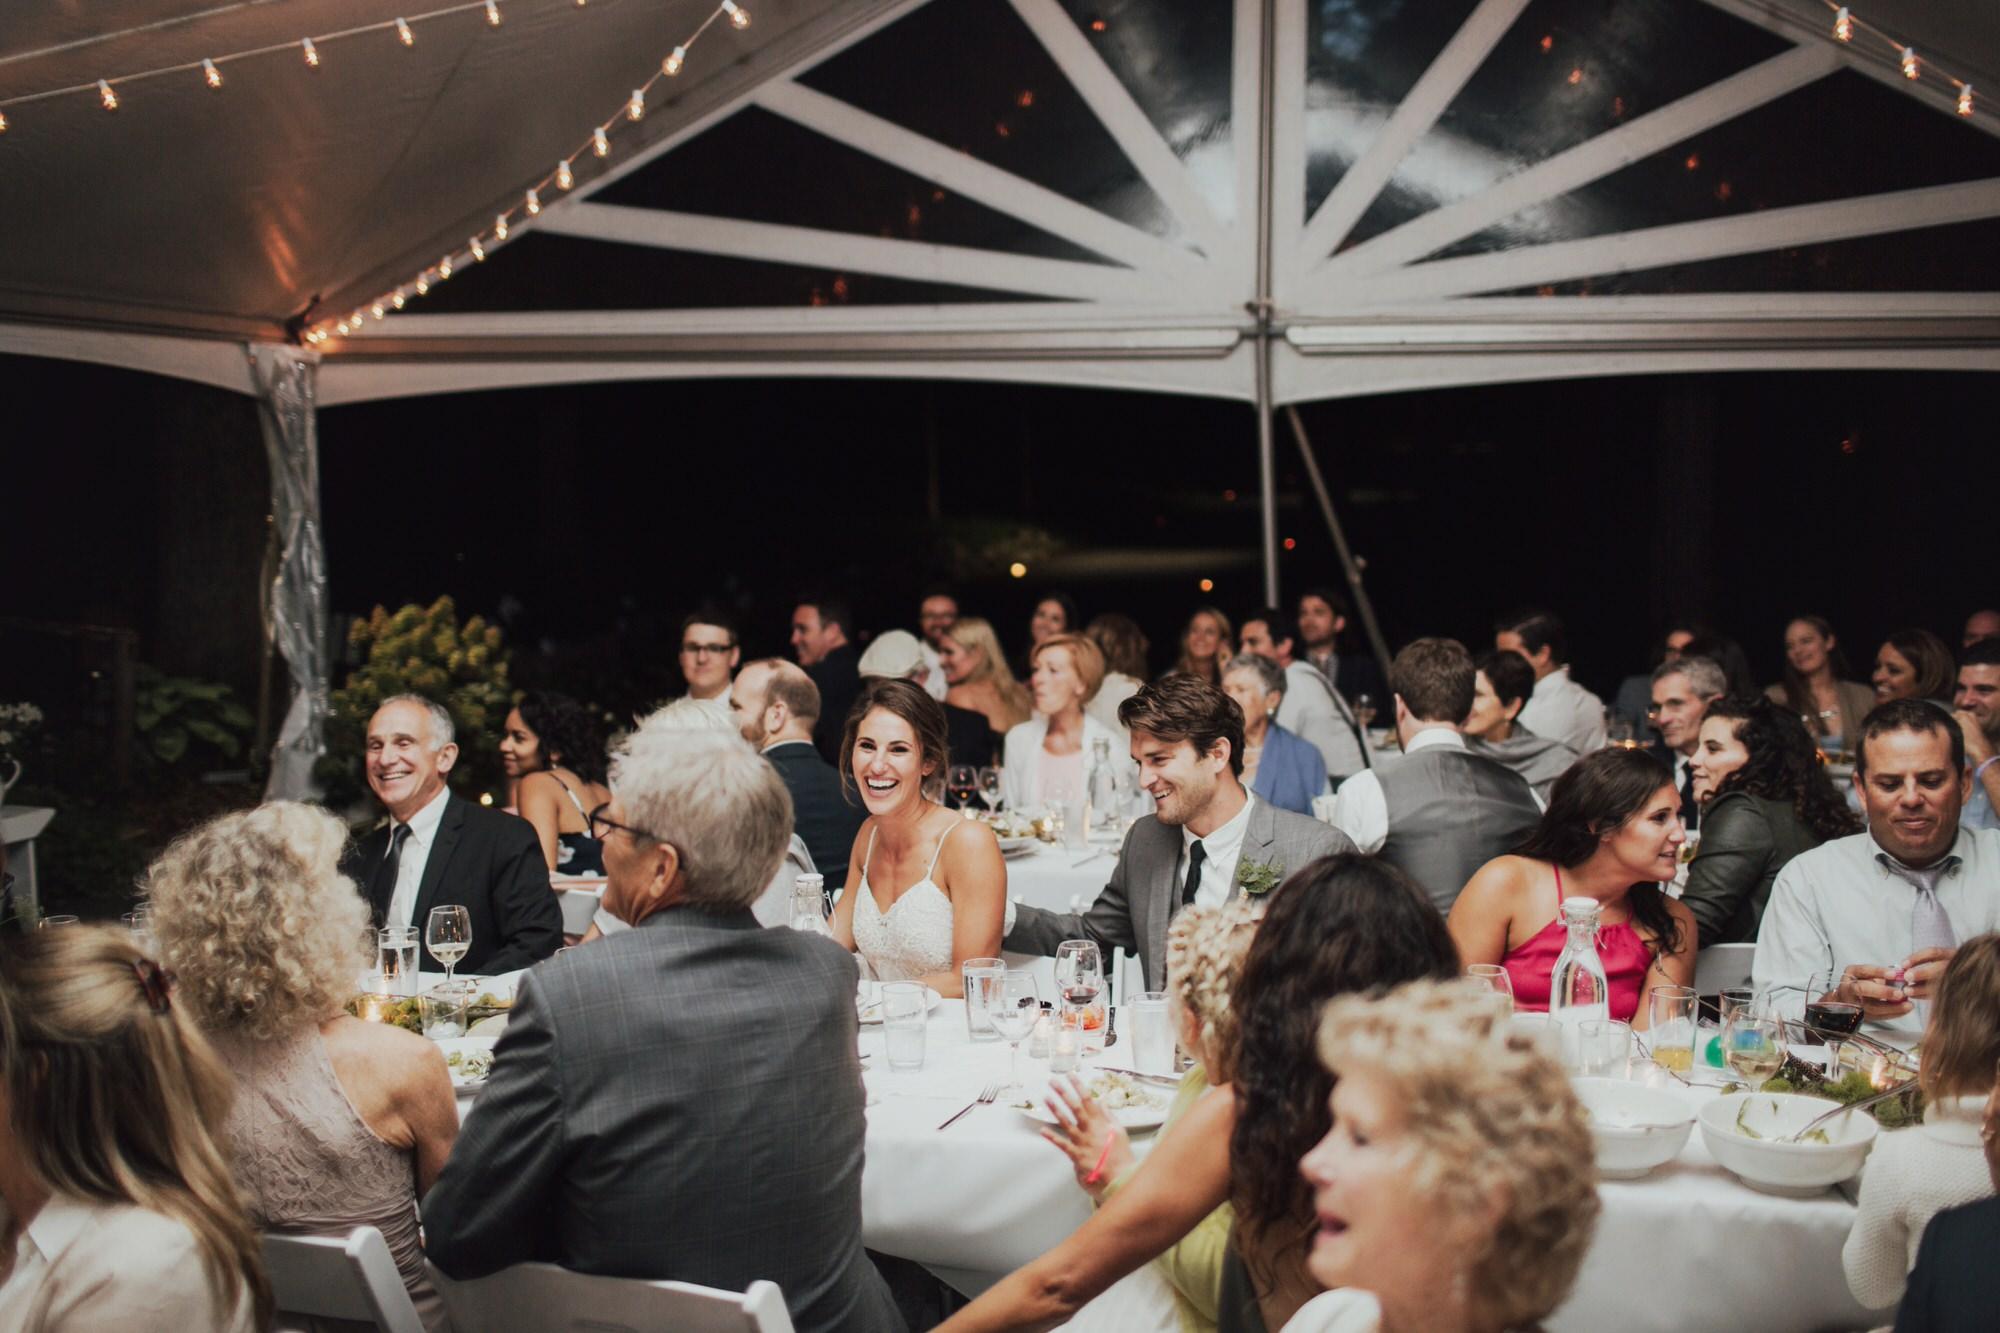 emily-aaron-rochester-new-york-wedding-photographer-116.JPG